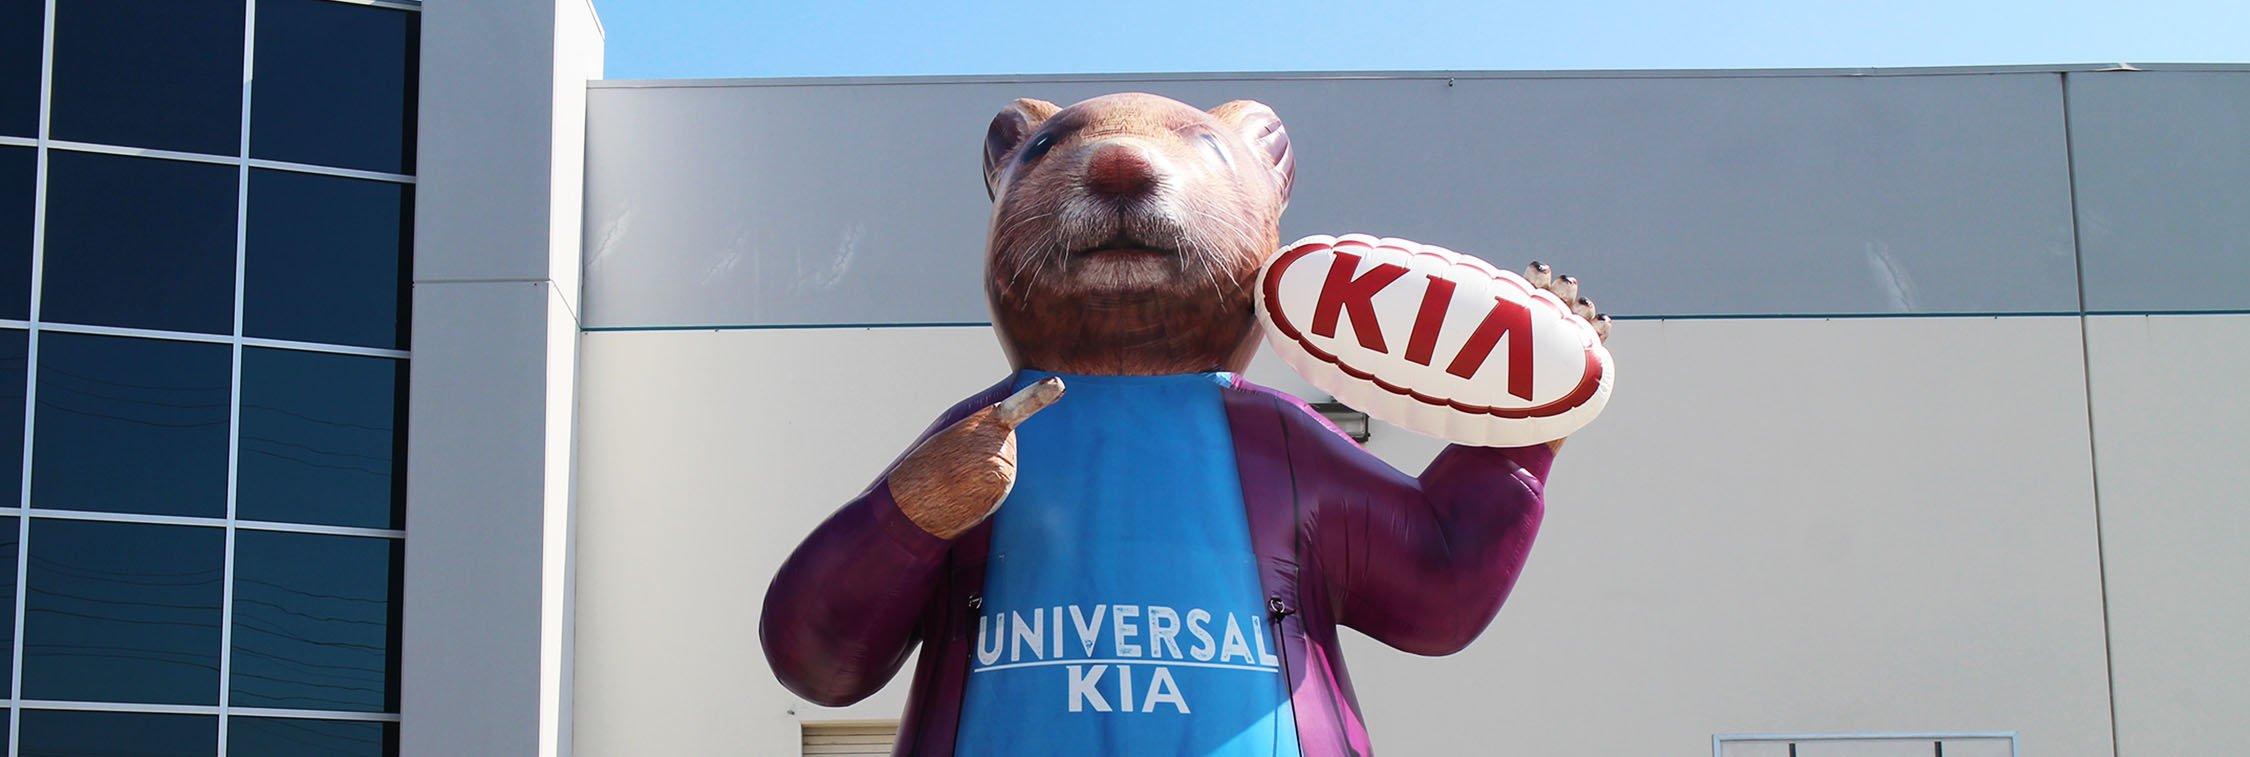 universal-kia-hamster-inflatable